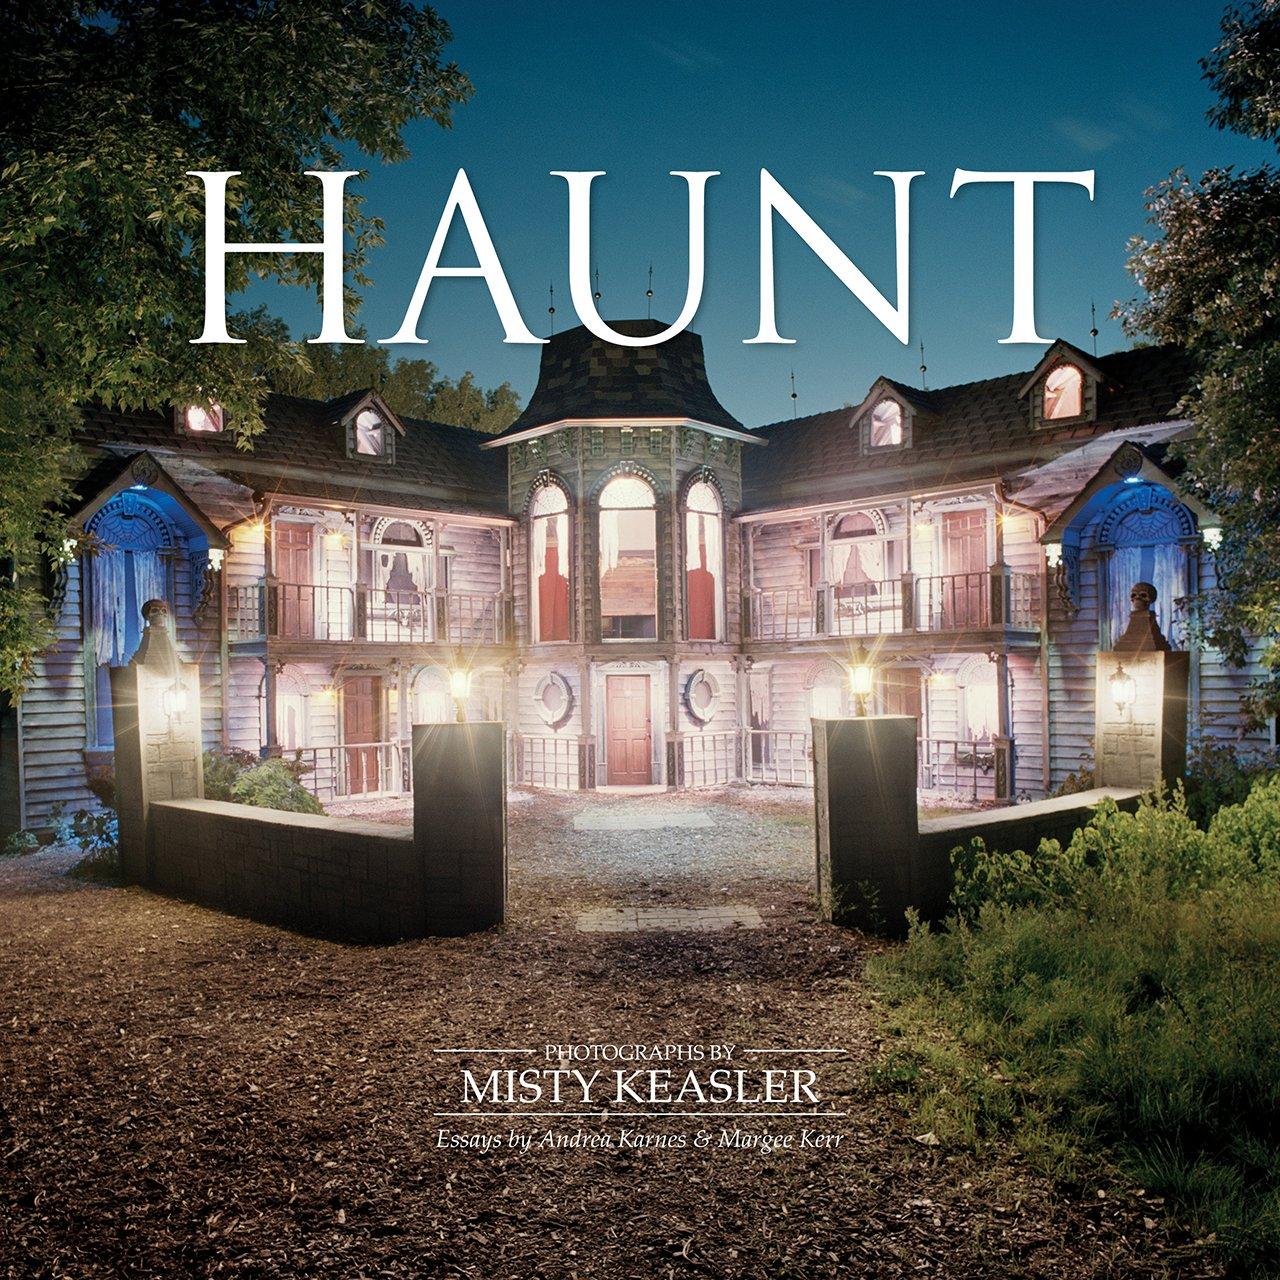 Amazon.com: Haunt (9780692896501): Misty Keasler: Books